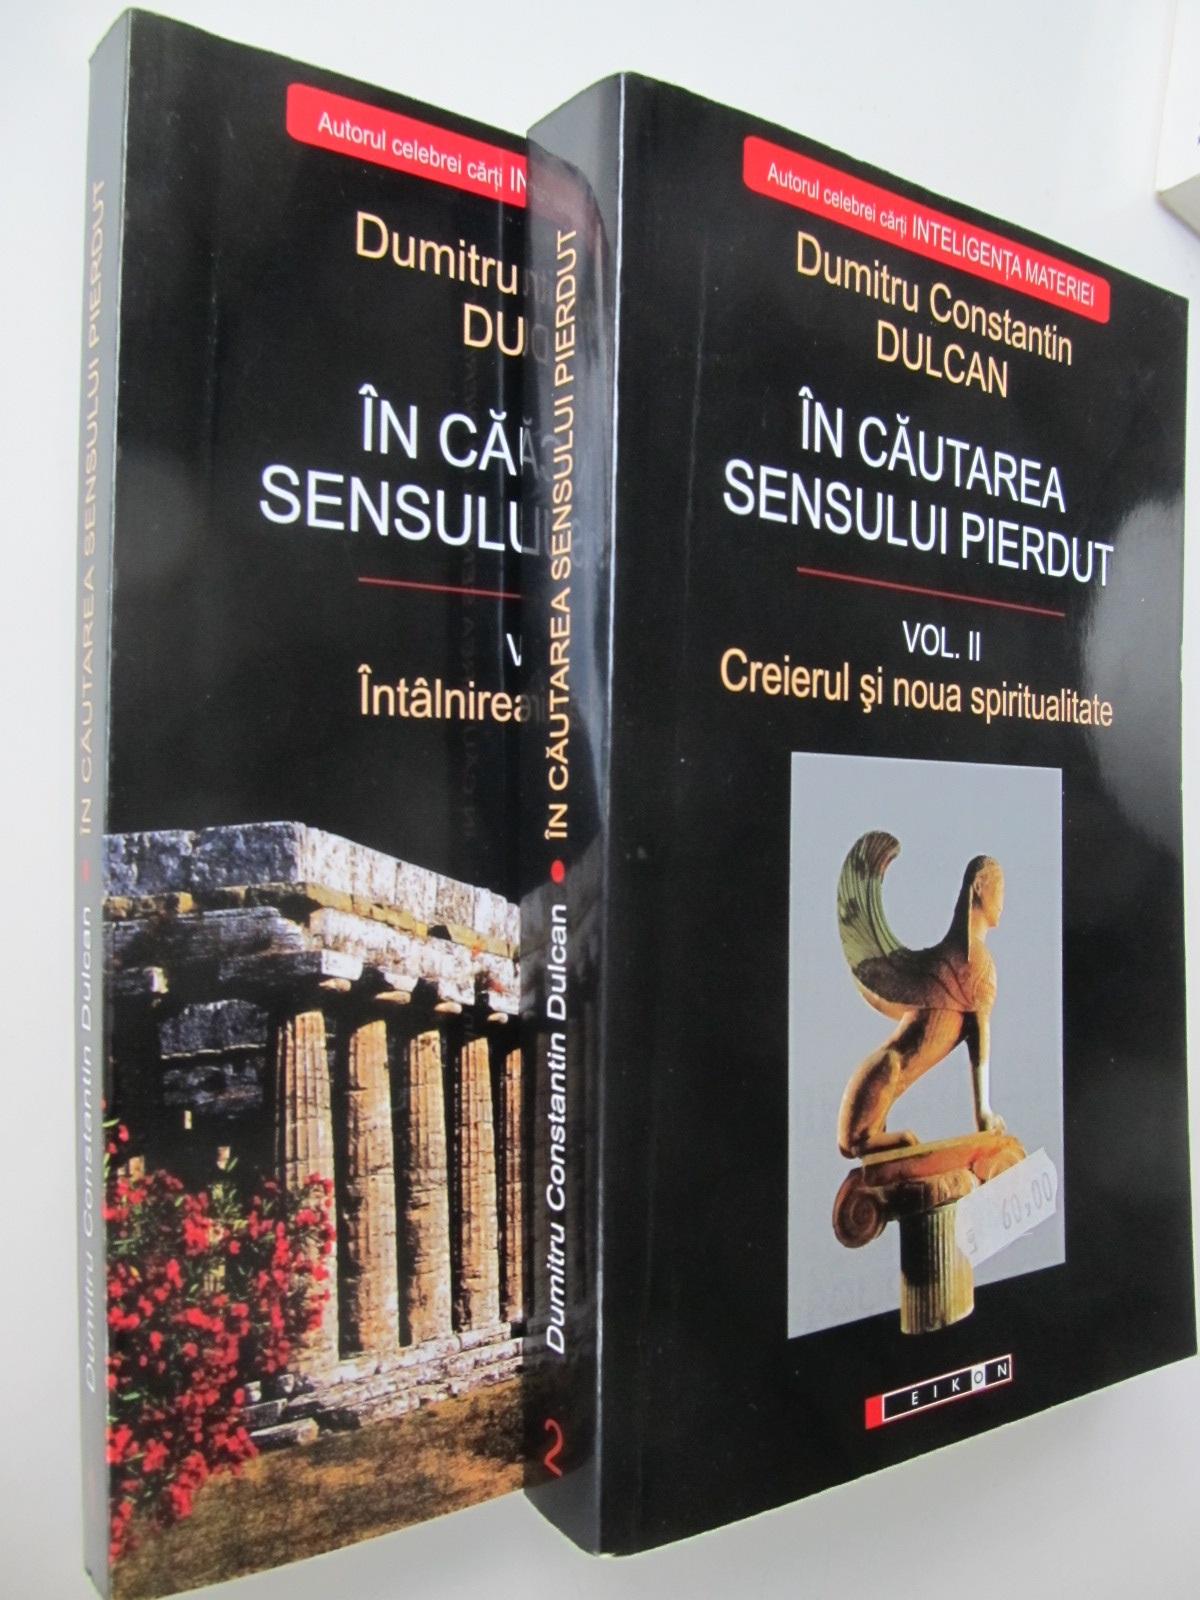 In cautarea sensului pierdut (2 vol.) - Dumitru Constantin Dulcan   Detalii carte